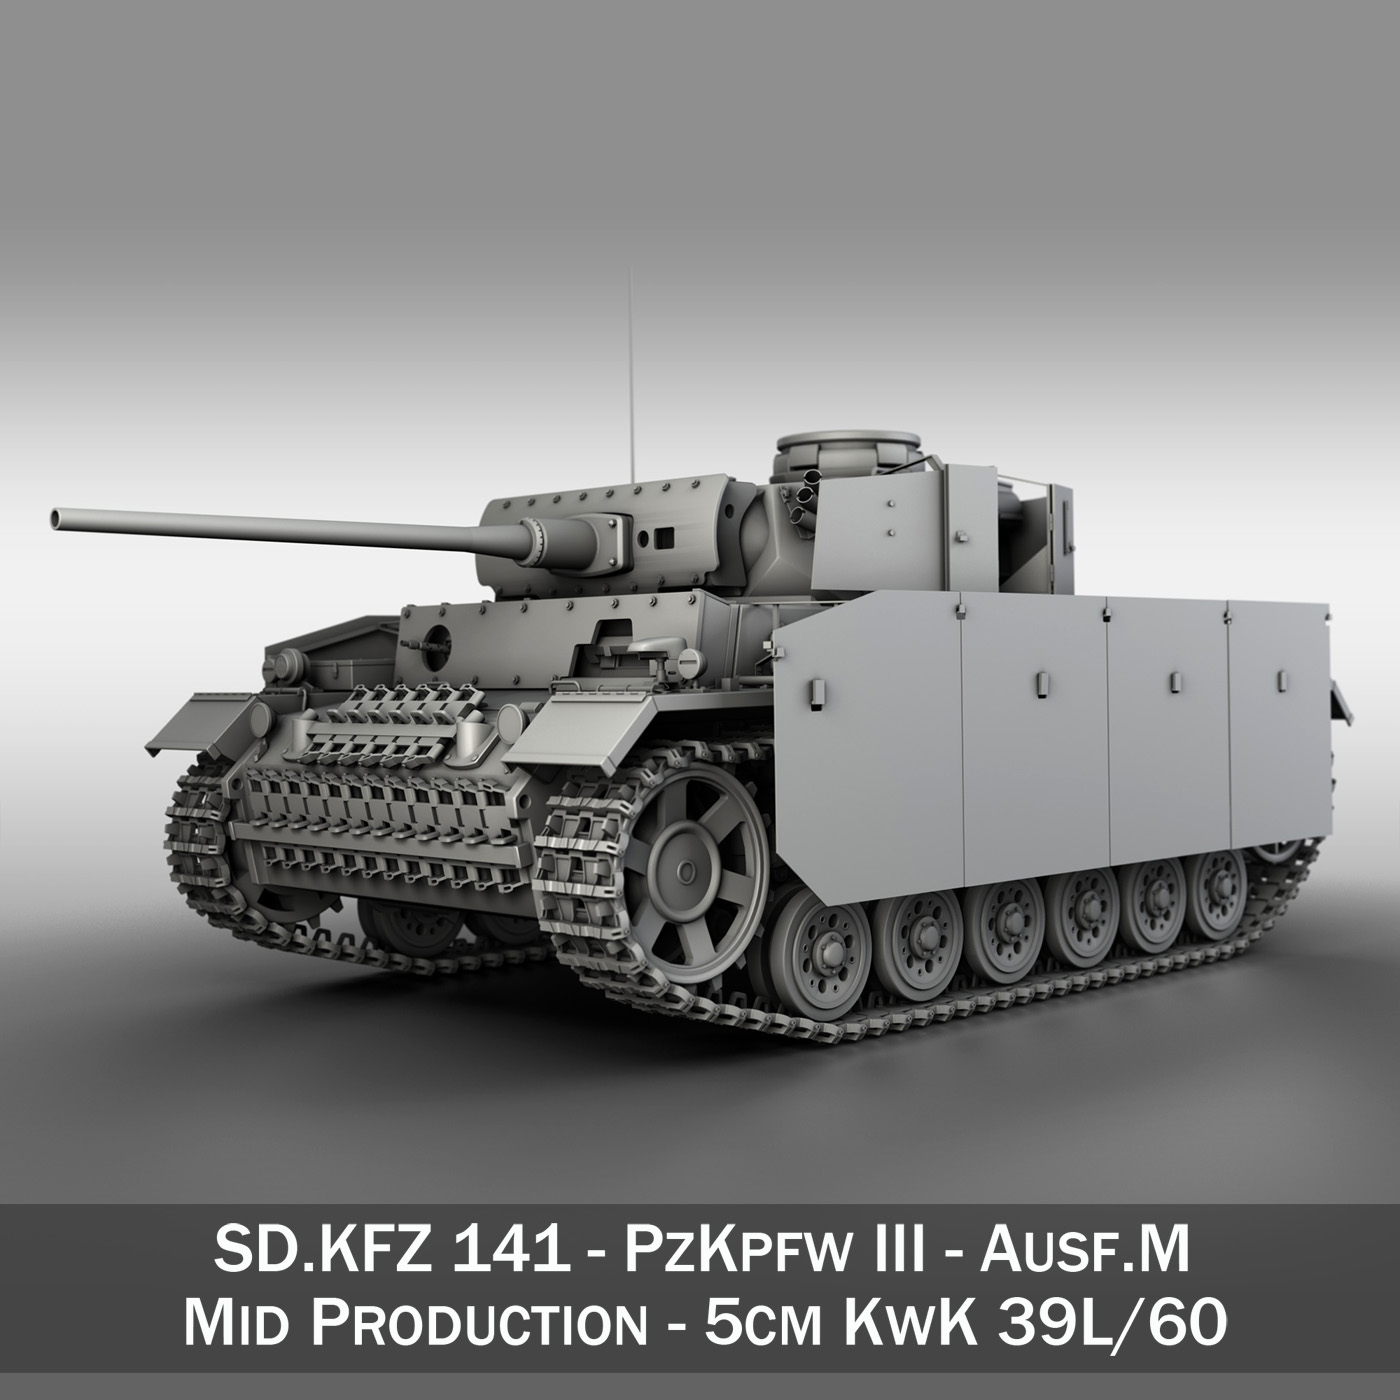 pzkpfw iii - panzer 3 - ausf.m Model 3d 3ds fbx c4d lwo obj 252165